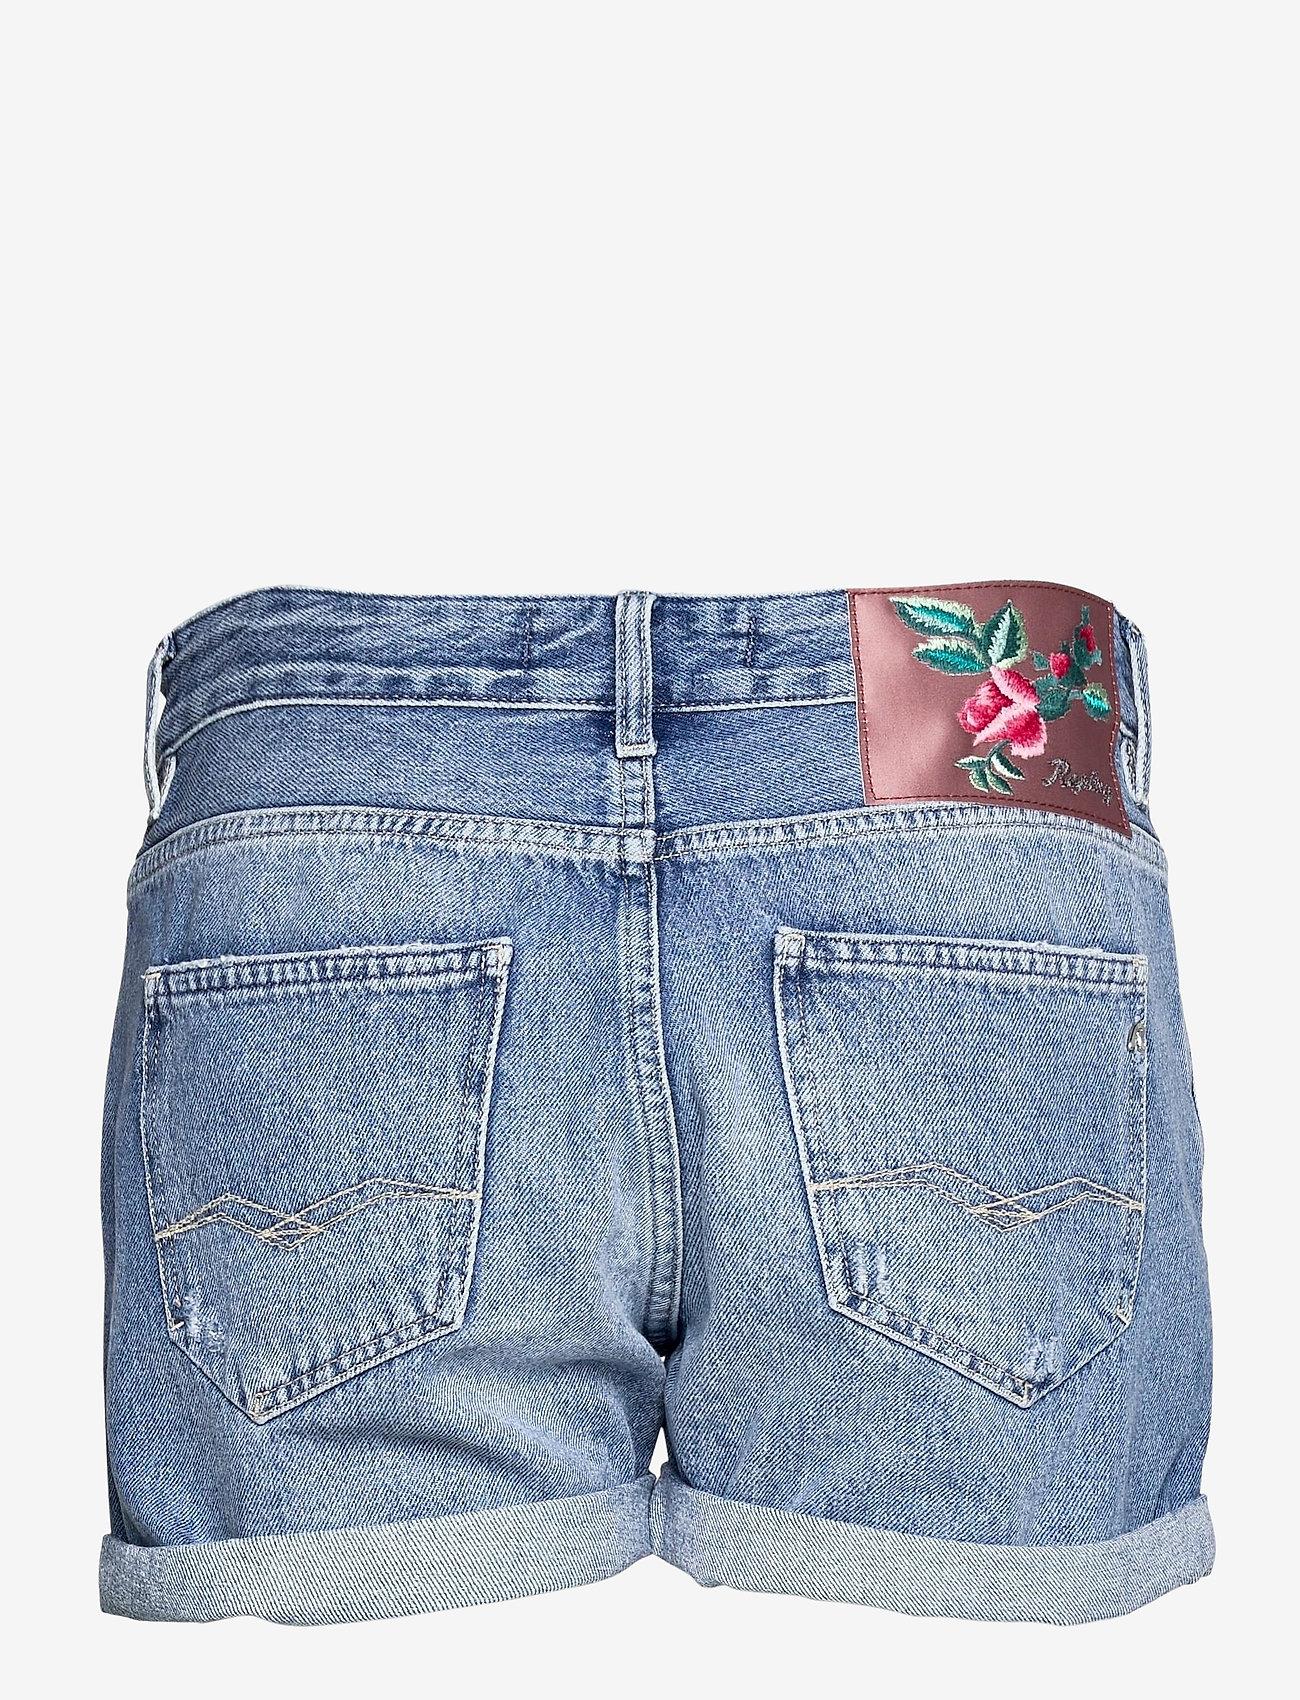 Replay - ANYTA Rose Label Pack - jeansshorts - medium blue - 1